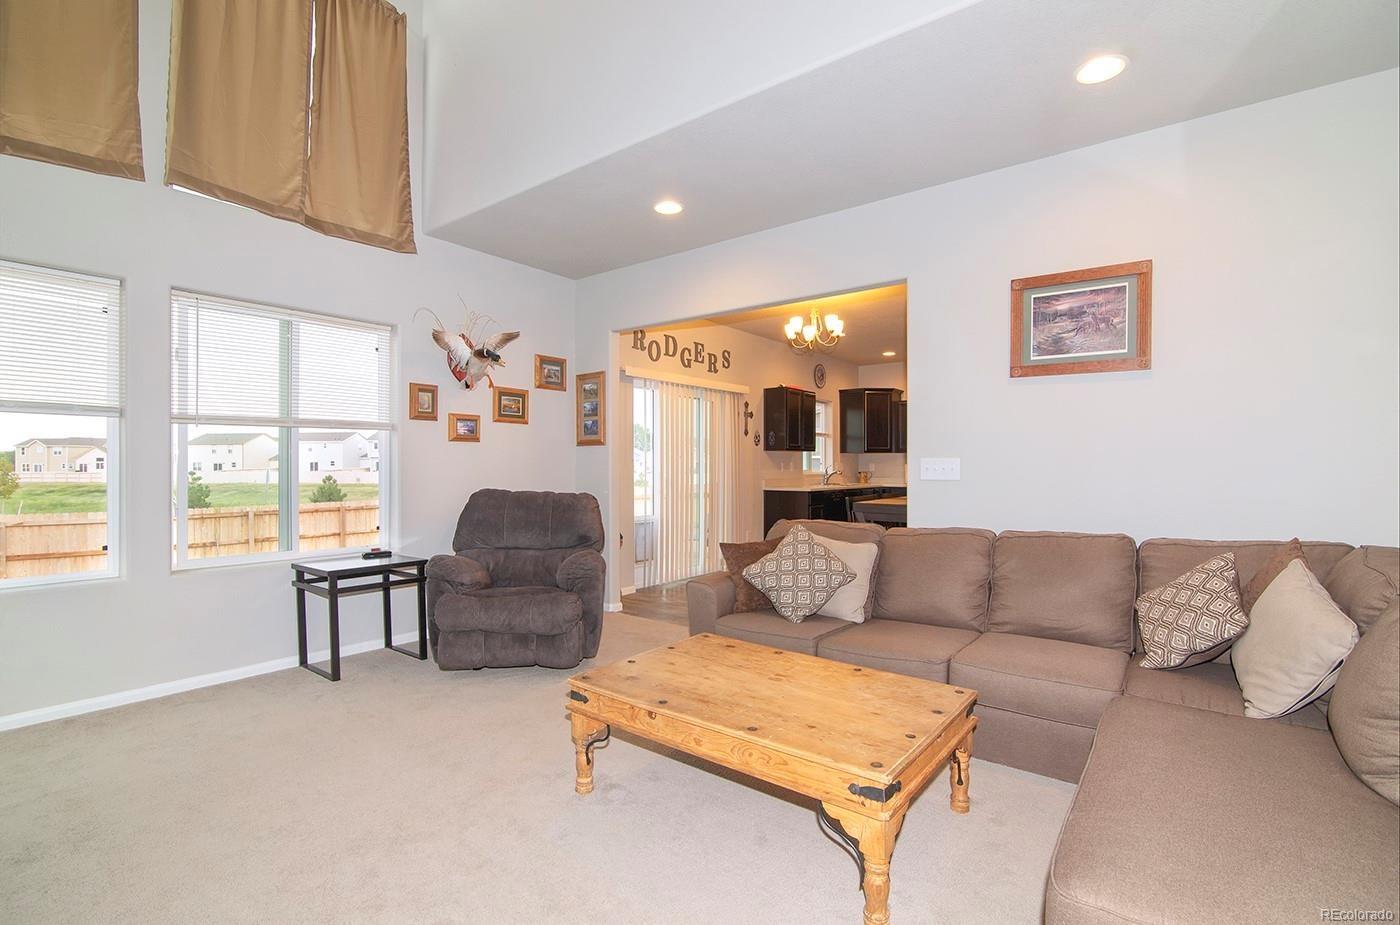 MLS# 7058019 - 5 - 9615 Rubicon Drive, Colorado Springs, CO 80925